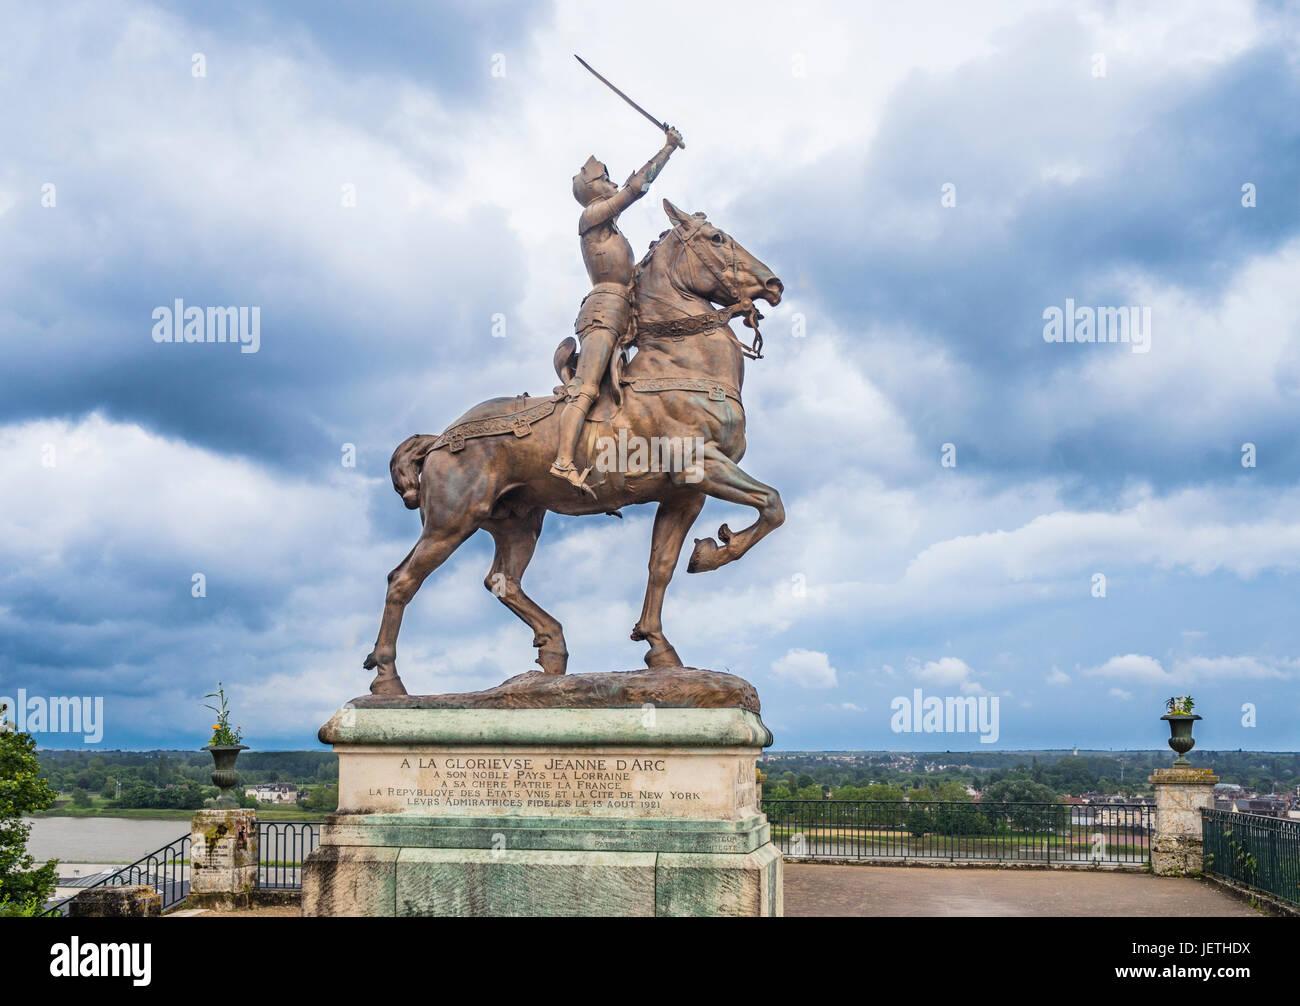 France, Centre-Val de Loire, Blois, Jeanne d'Arc (Joan of Arc) equestrian bronce sculpture at the gardens of - Stock Image